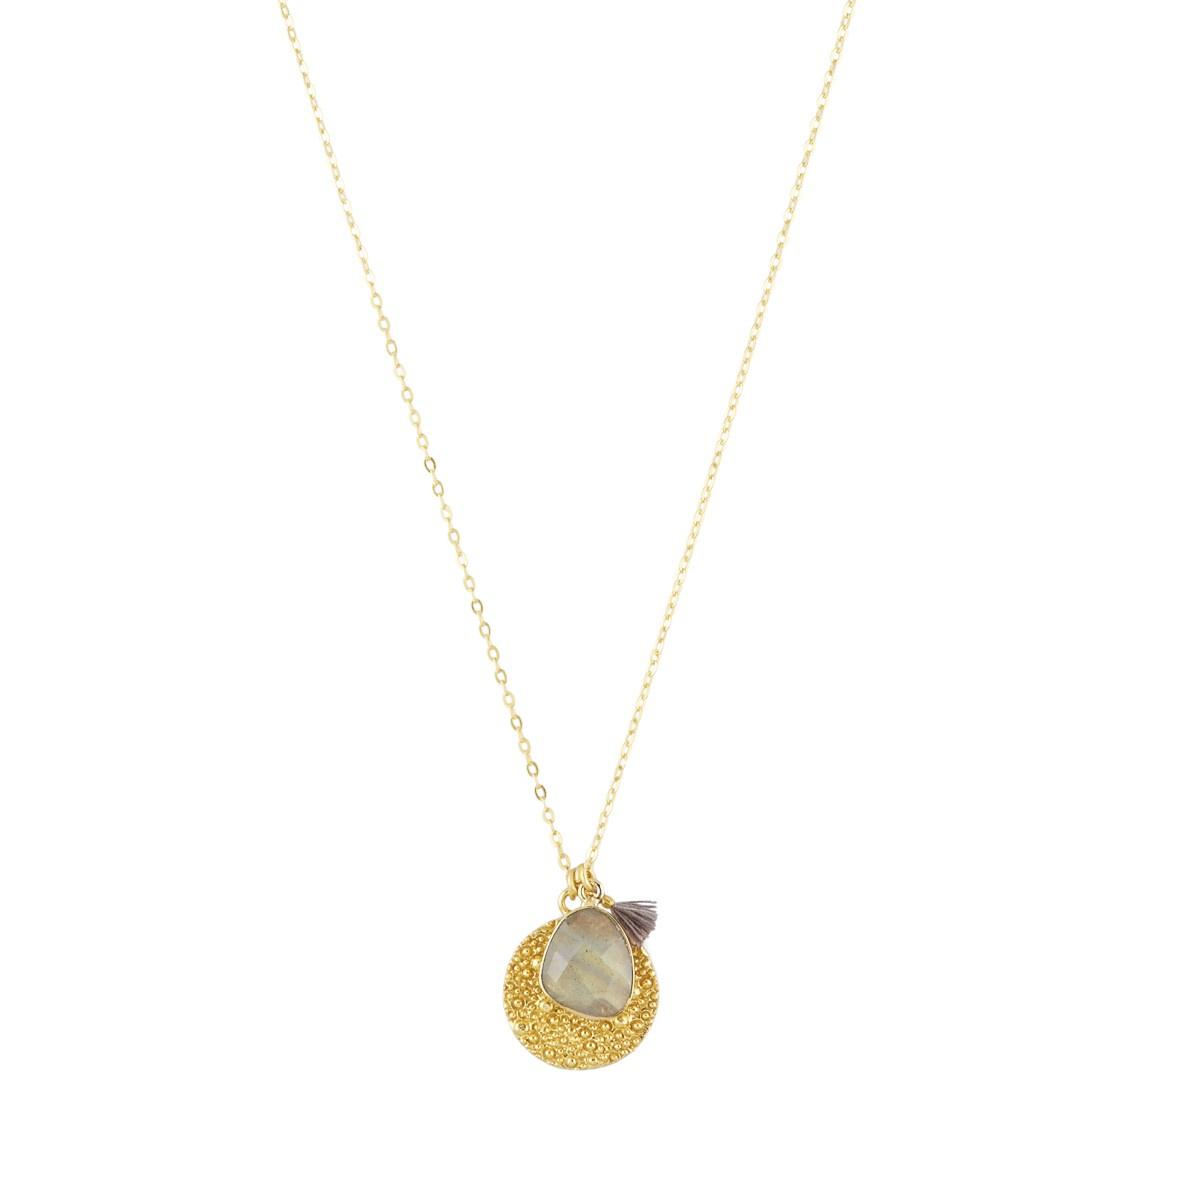 Spell Coin Necklace with semi precious gemstone by Ashiana